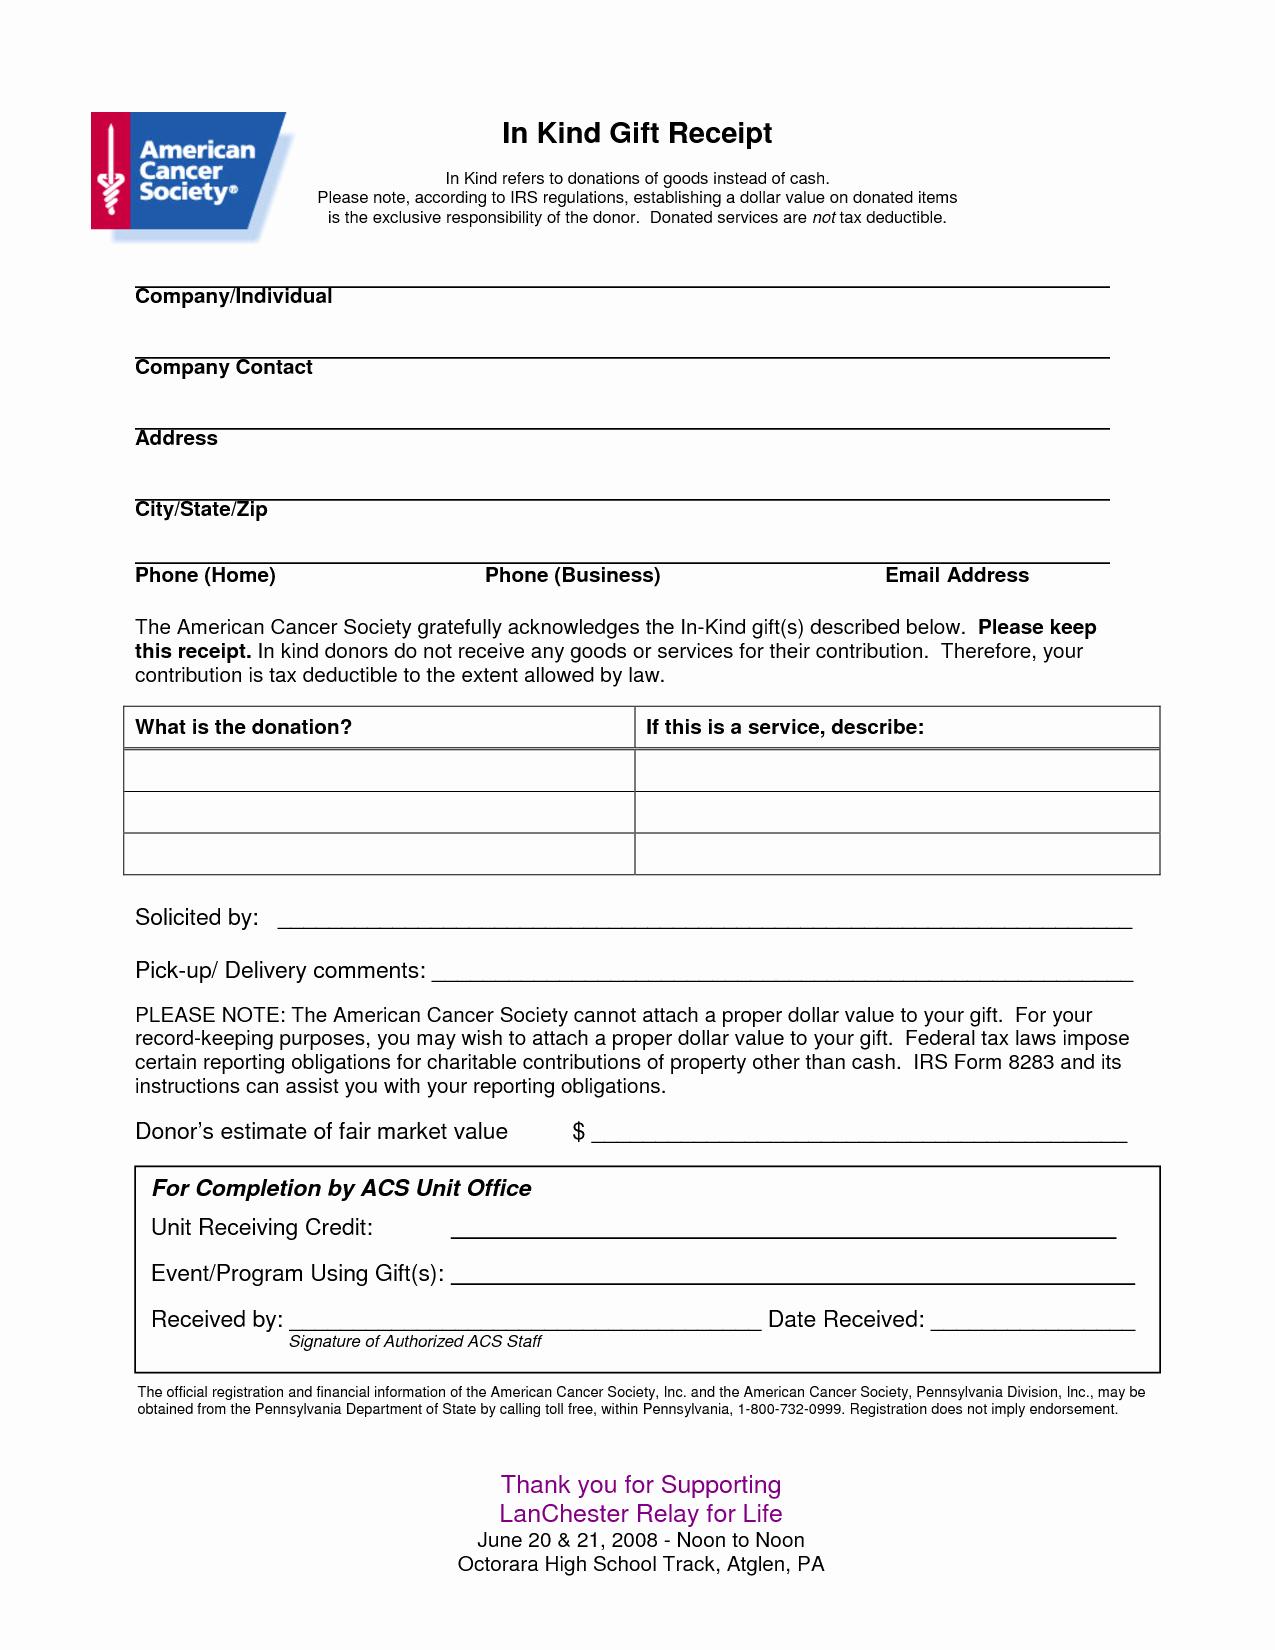 Charitable Donation Receipt Template Inspirational Non Profit Receipt Of Cash Donation Letter Template